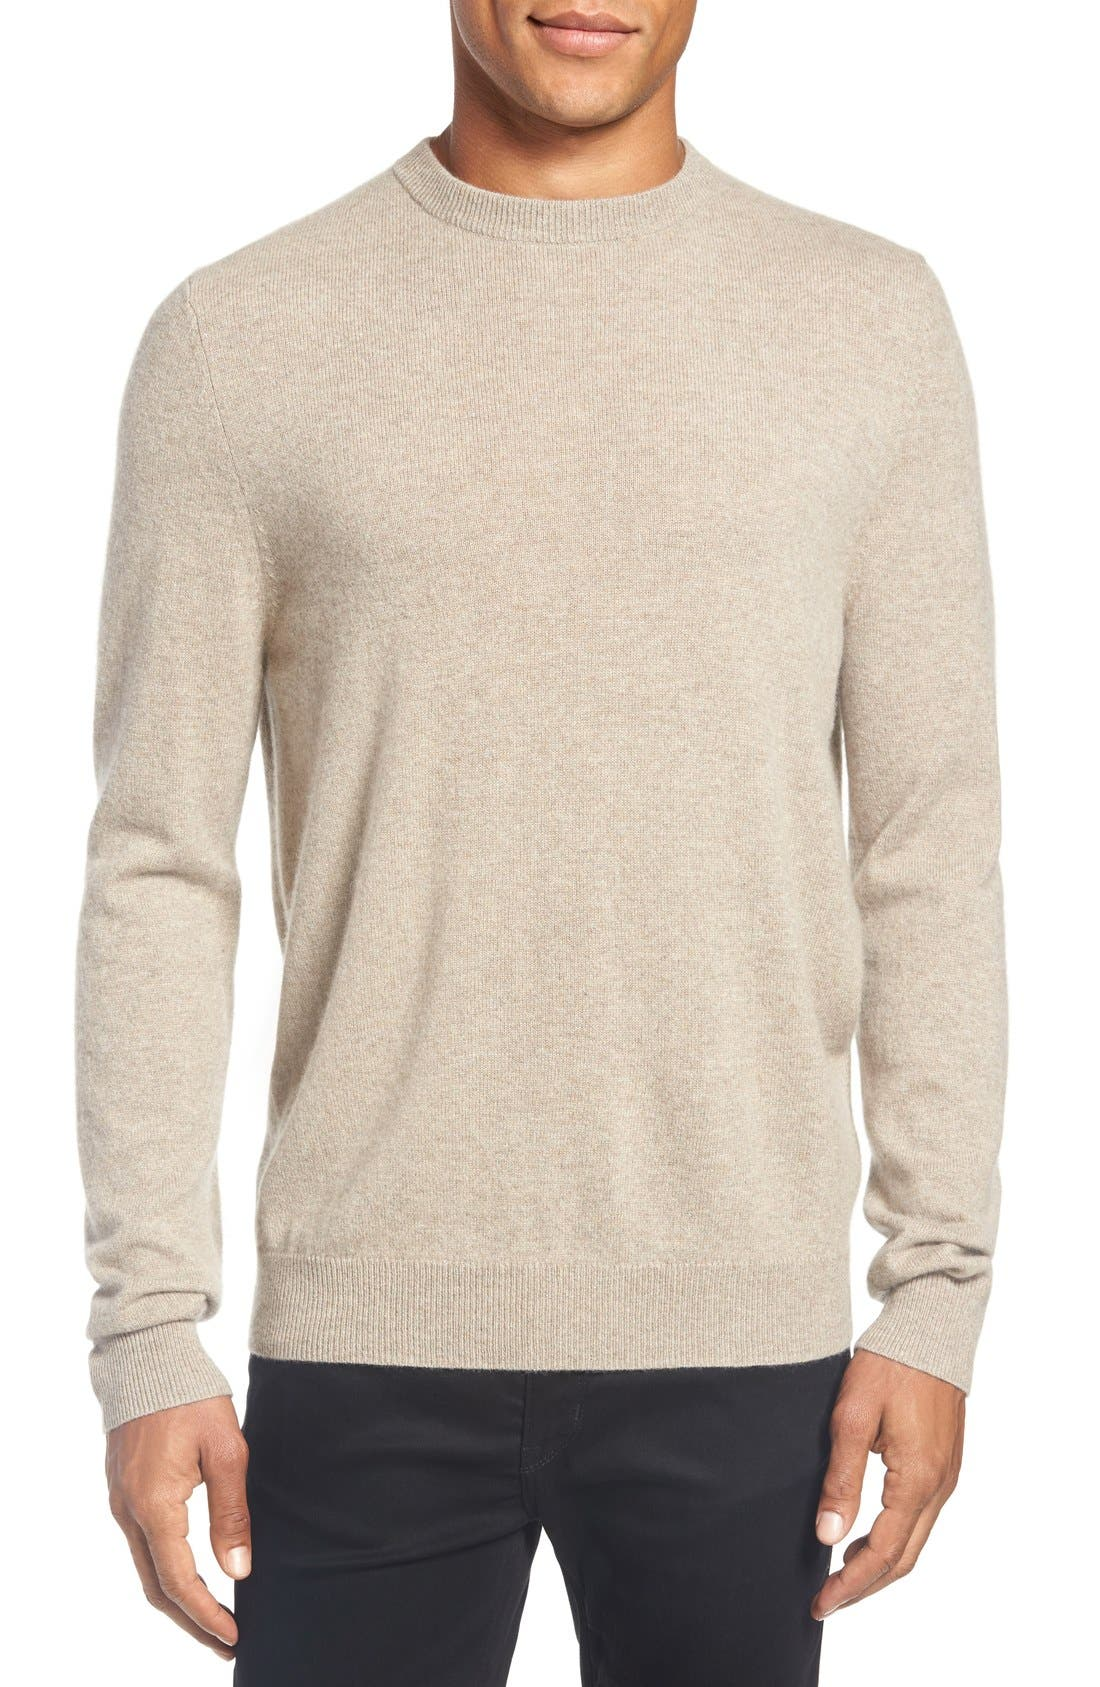 Nordstrom Men's Shop Cashmere Crewneck Sweater (Regular & Tall)